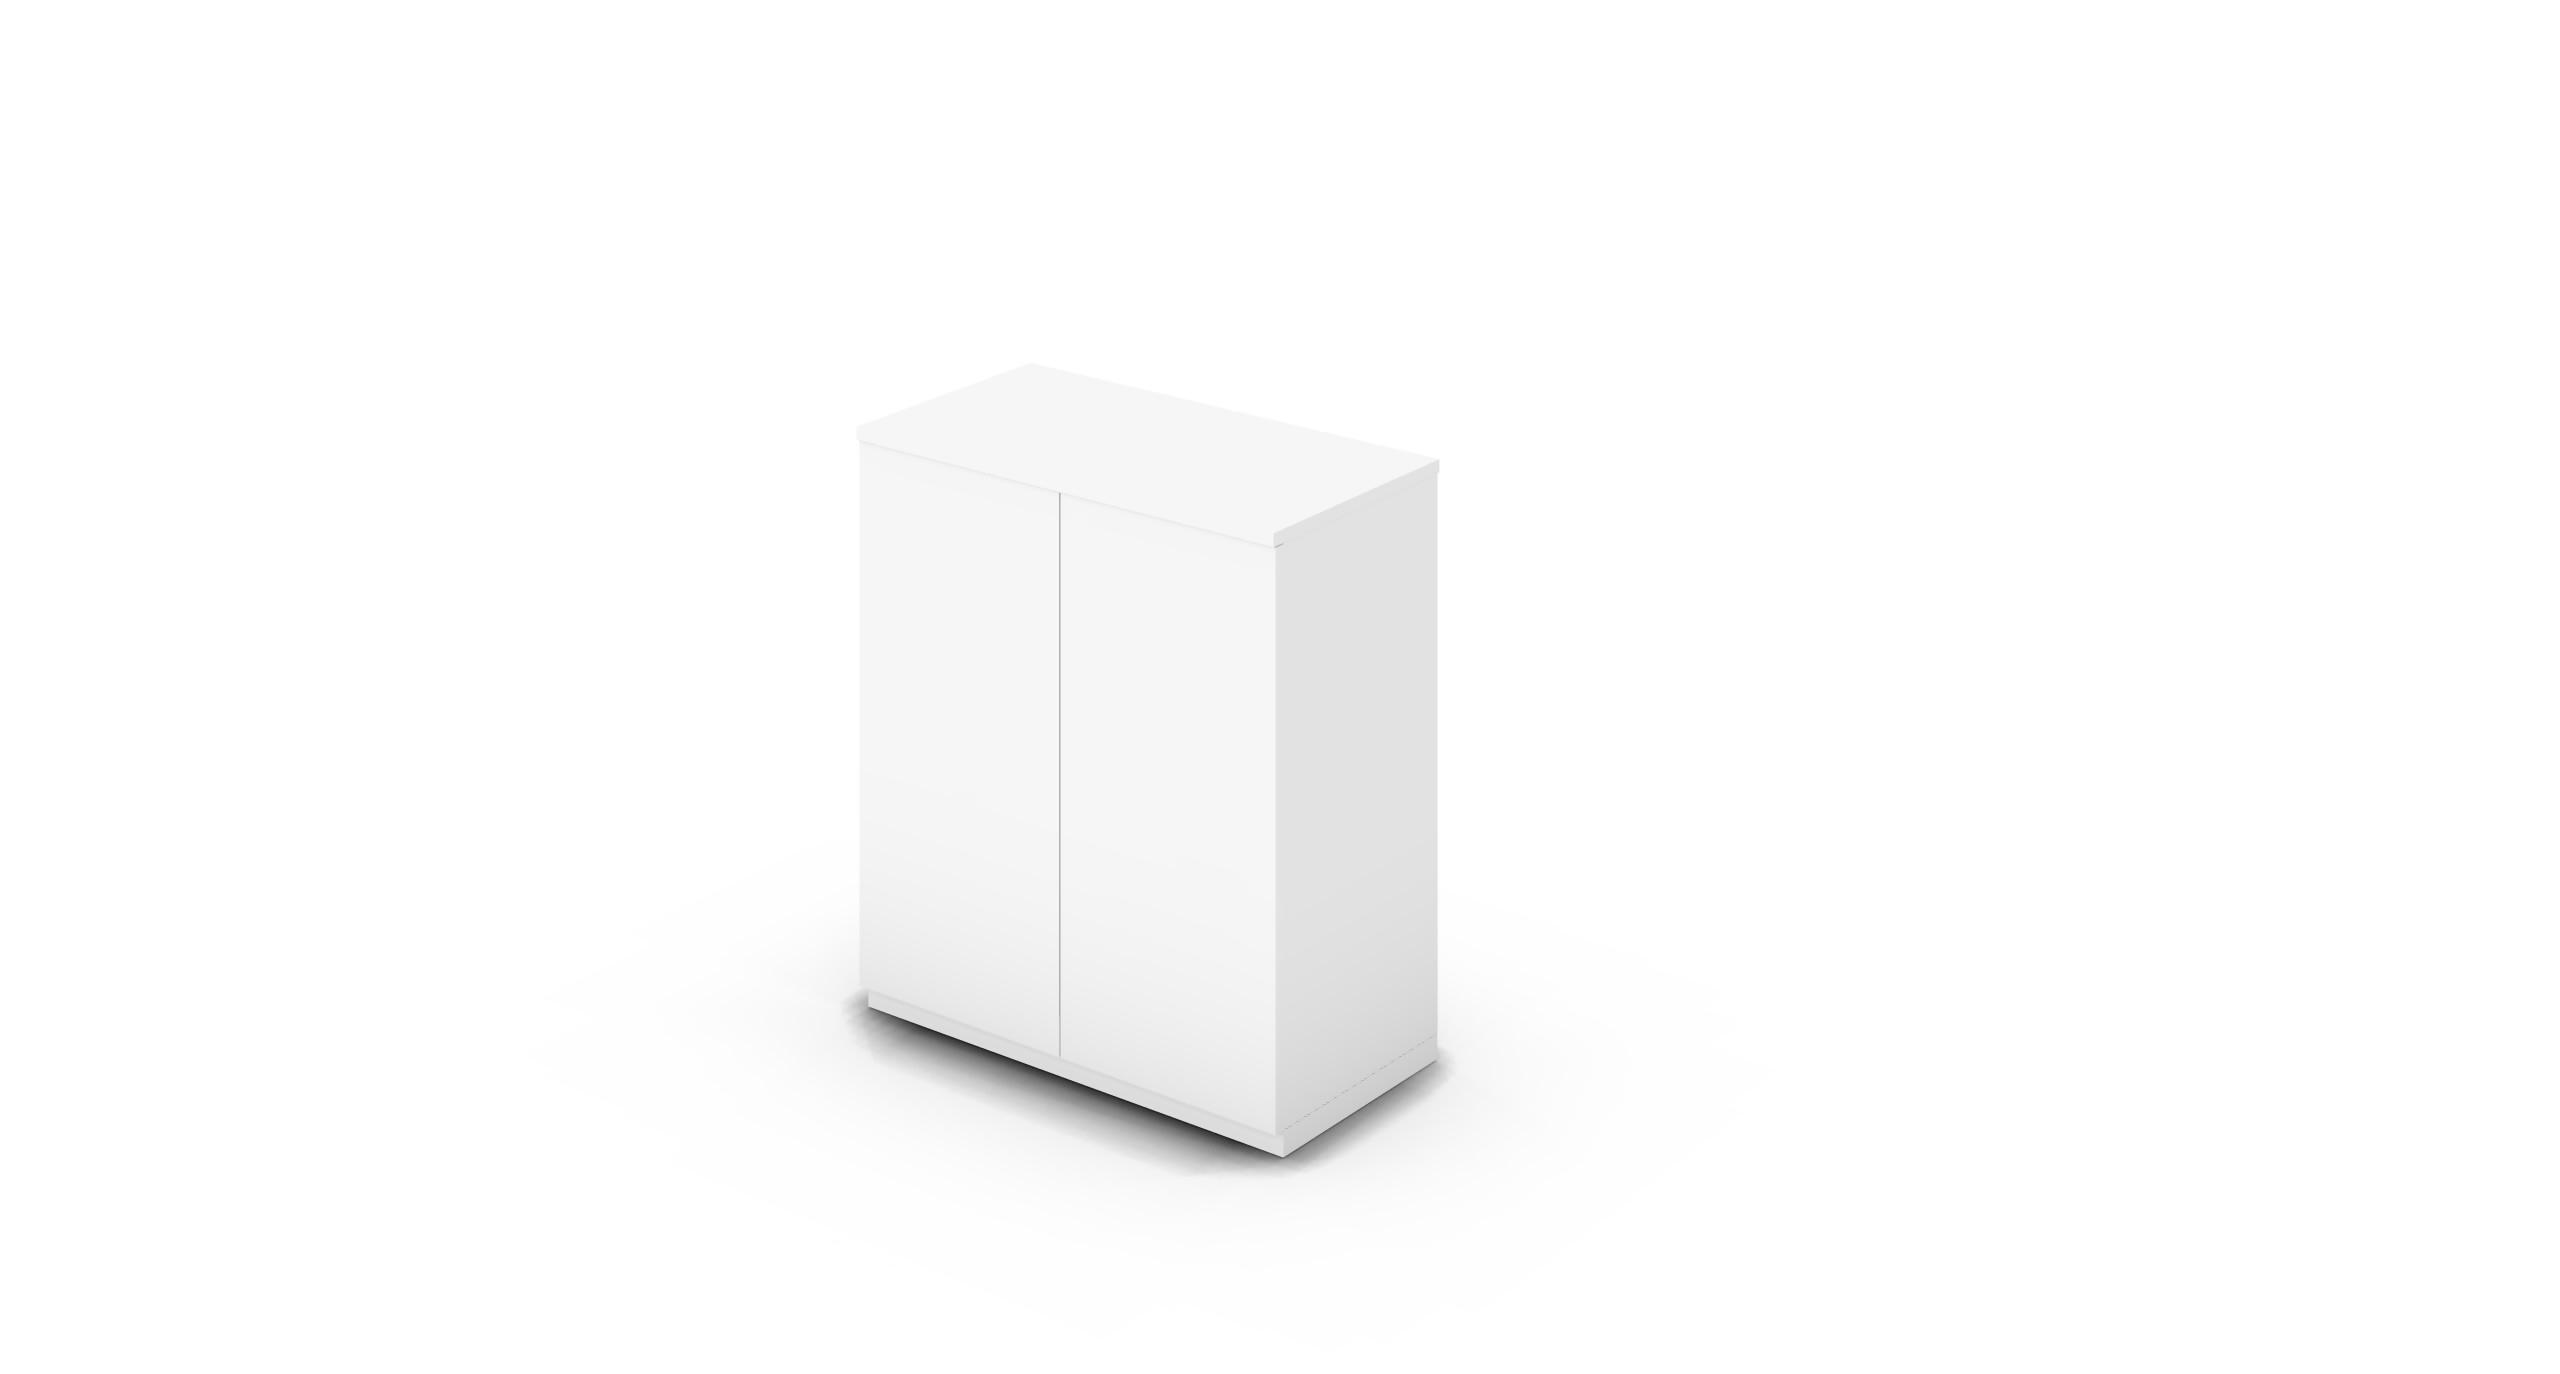 Cabinet_900x450x1125_HD_White_Push_NoCylinder